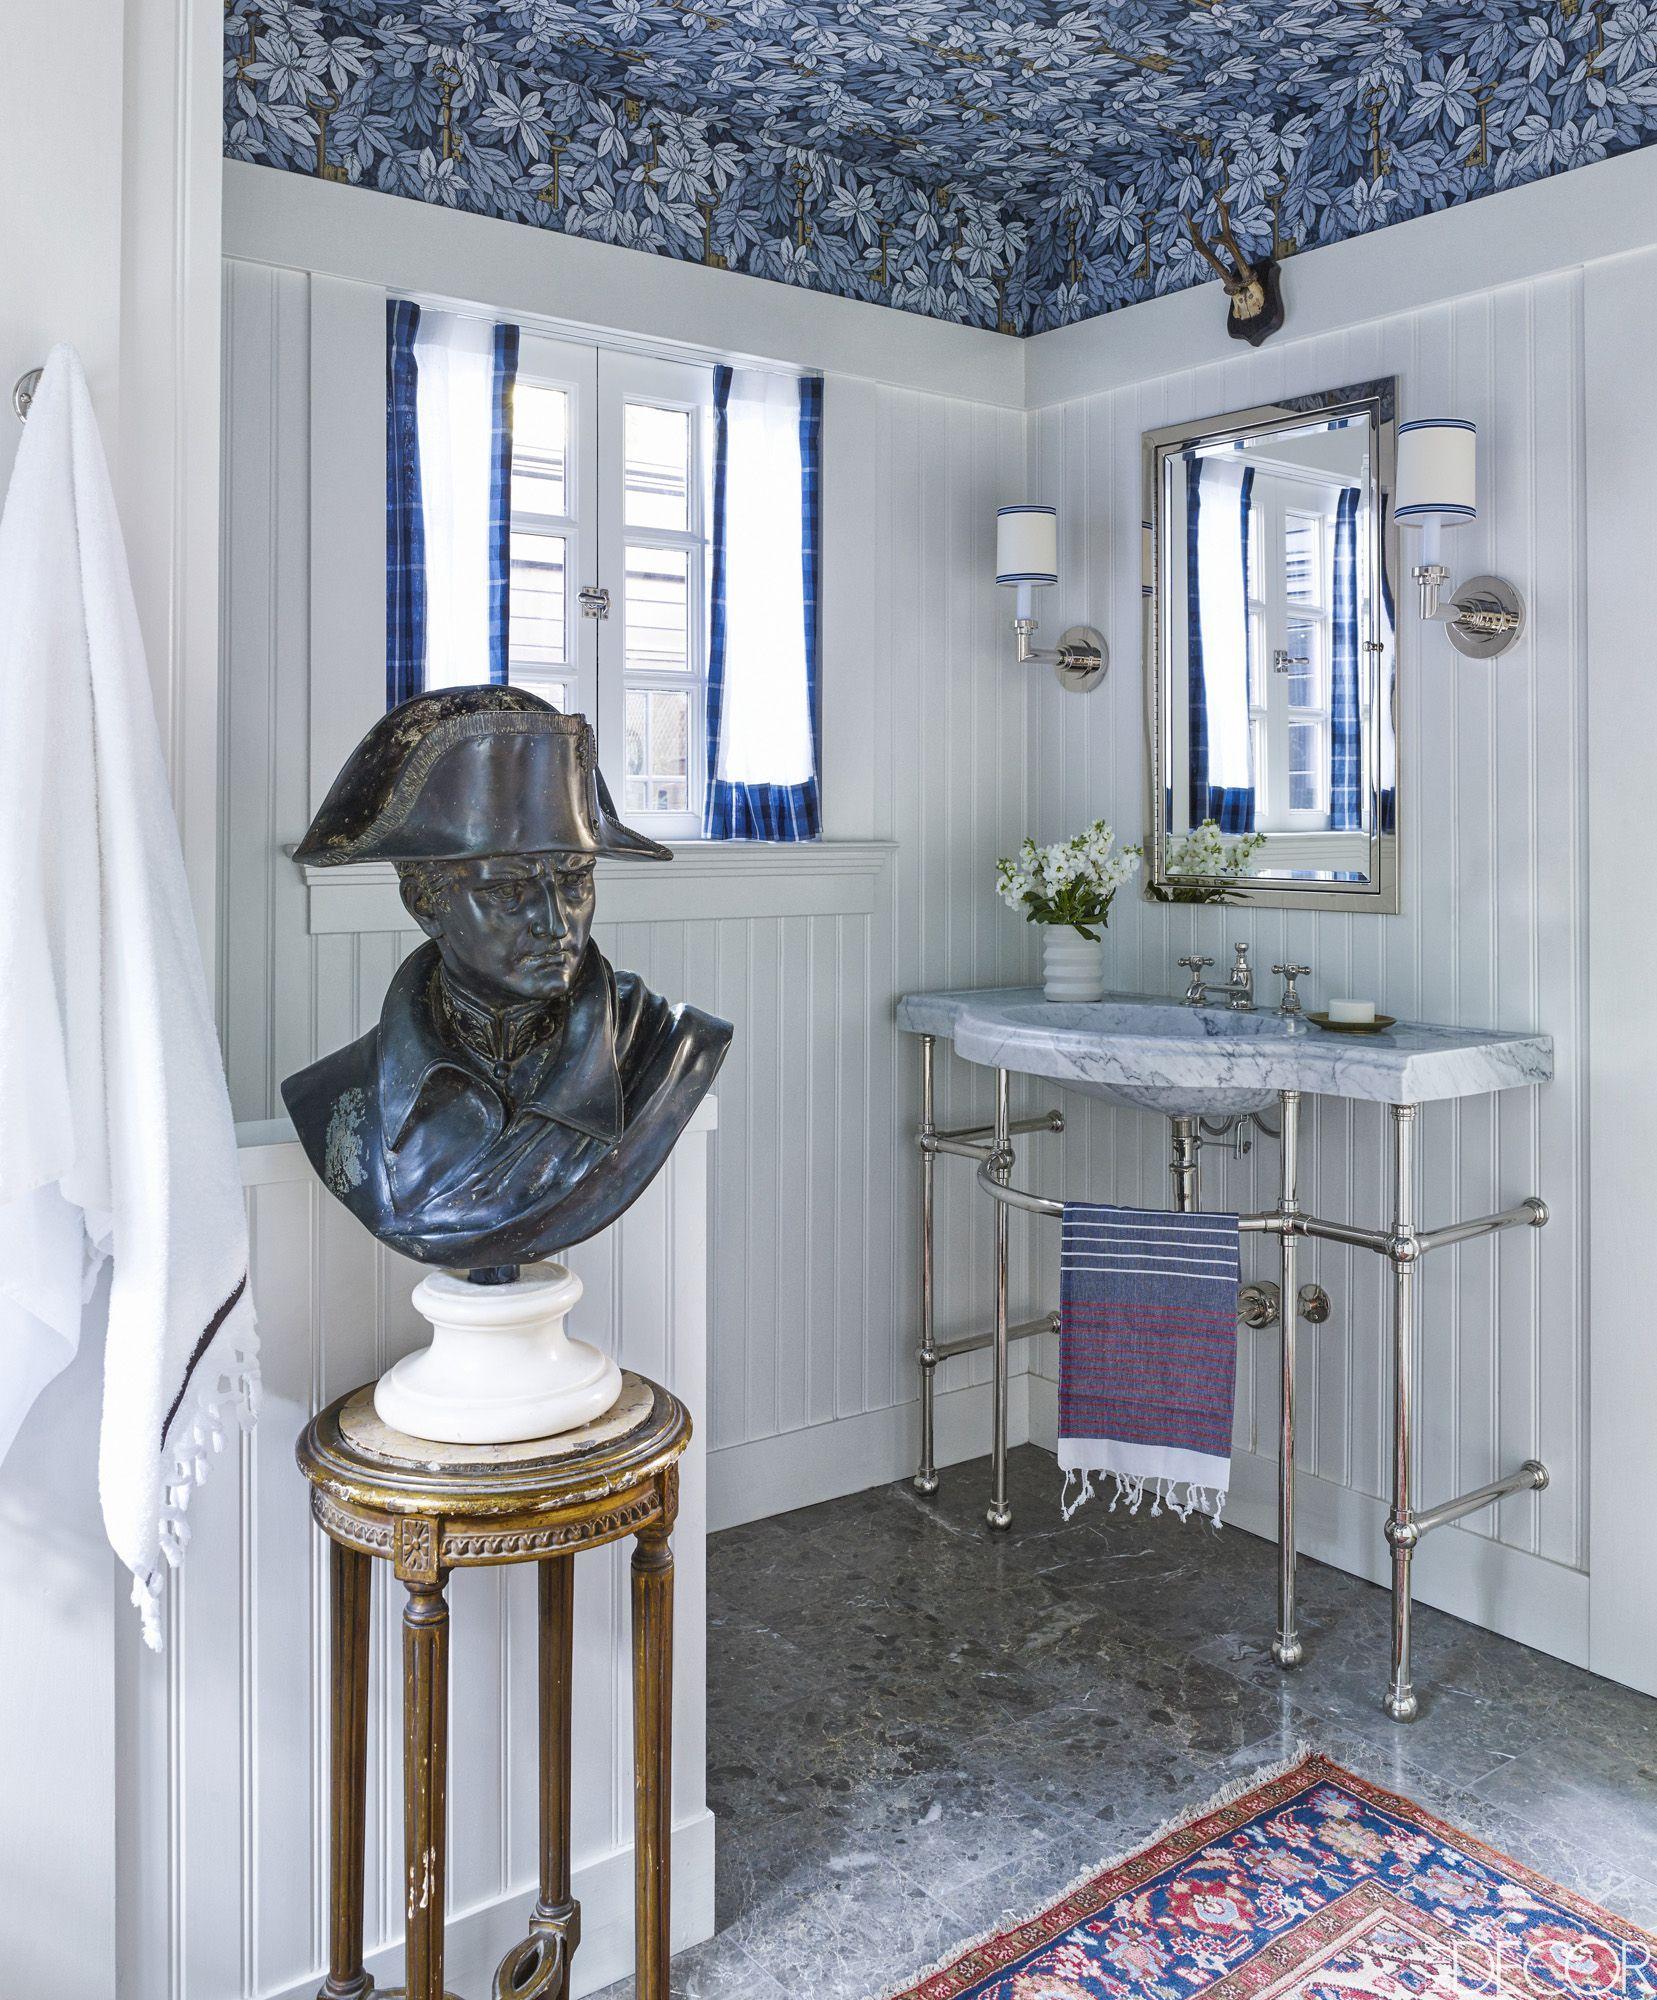 100 Beautiful Bathrooms Ideas & Pictures - Bathroom Design ... on Beautiful Bathroom Ideas  id=53347